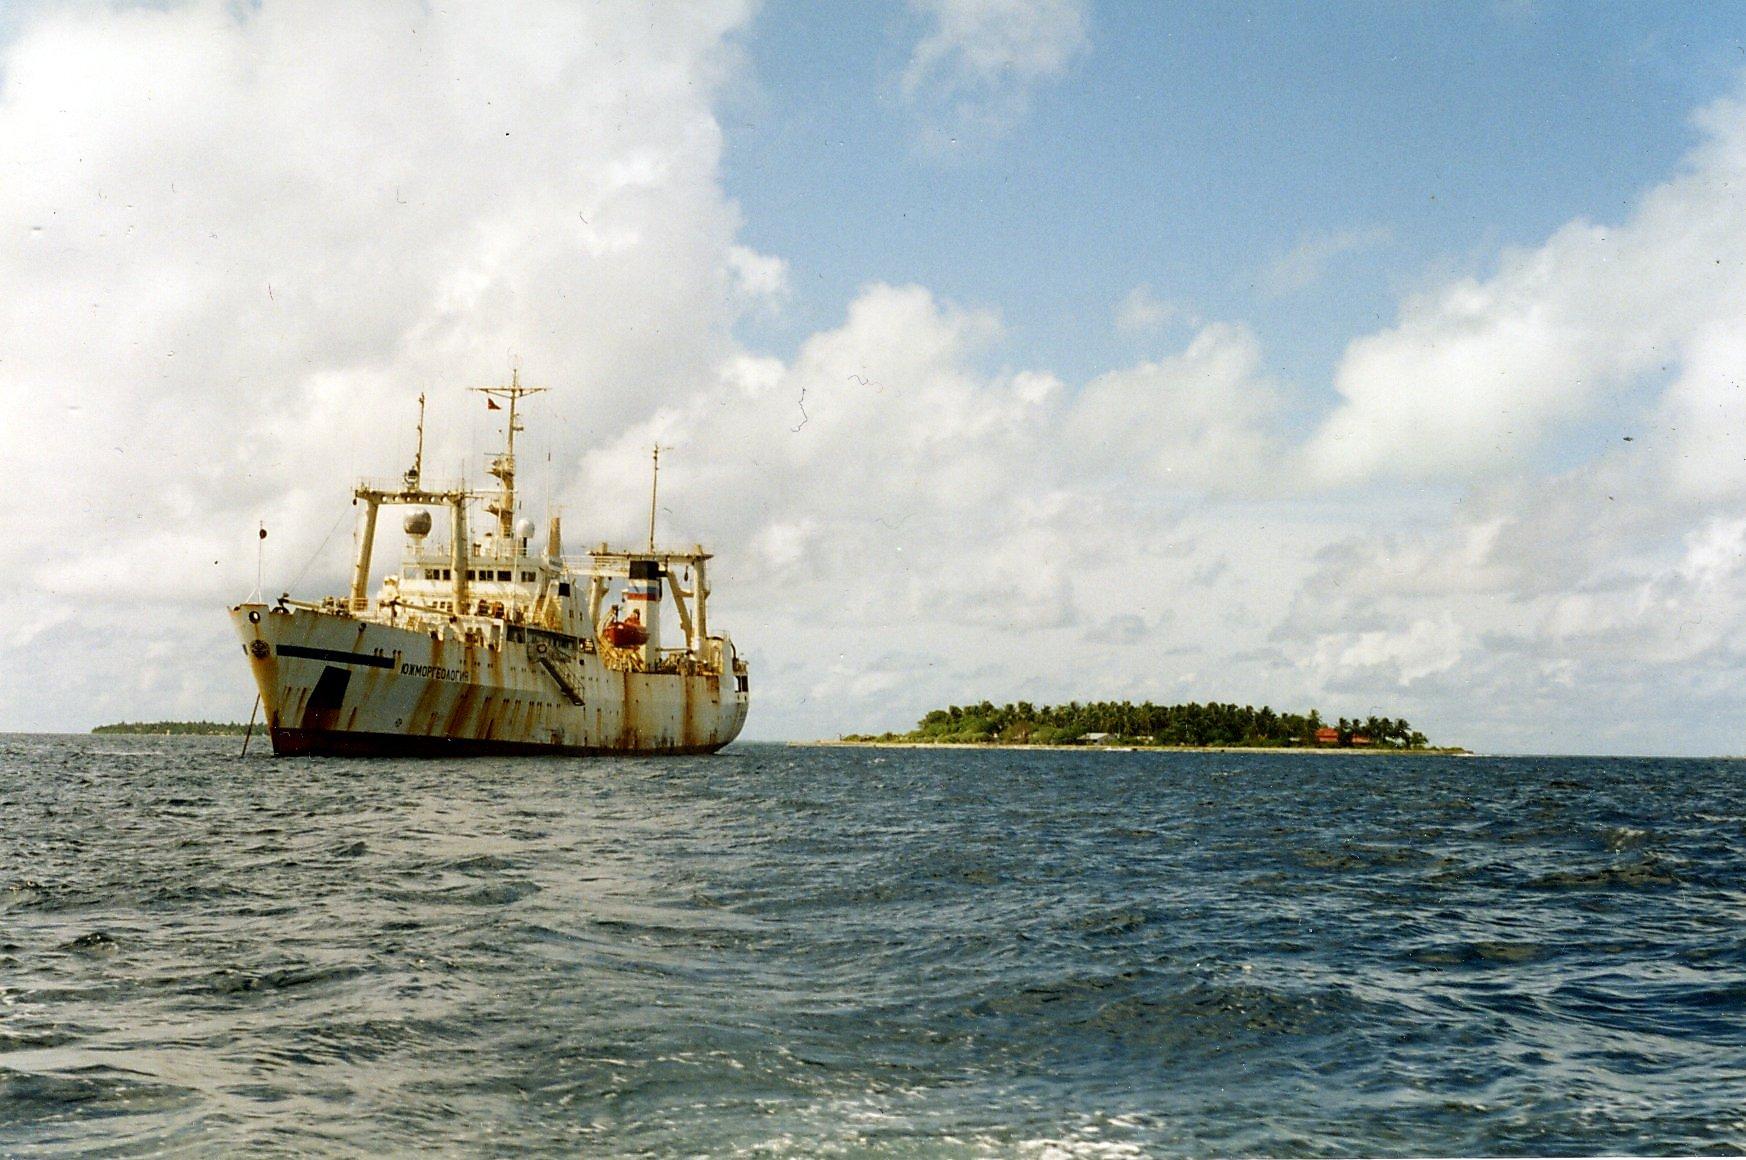 yuzhmorgeologia na Maldives.jpg